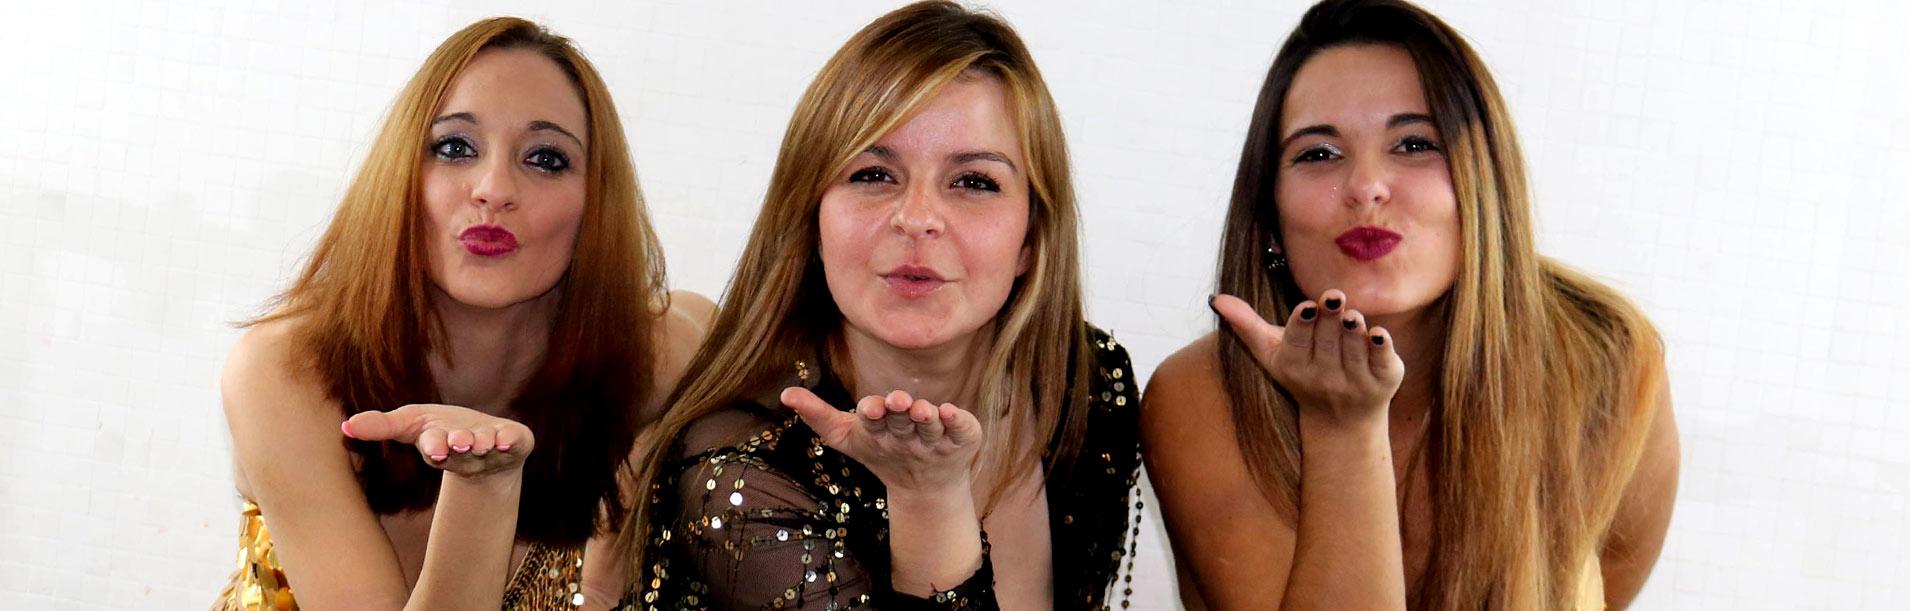 Suzy, Cantora Suzy, Contactos, Artista Suzy, Cantora, Musica Popular, Artista Portuguesa, Pimba, artistas, cantoras, Espectaculos. Portuguese singers, Chanteurs portugais, musique portugaise